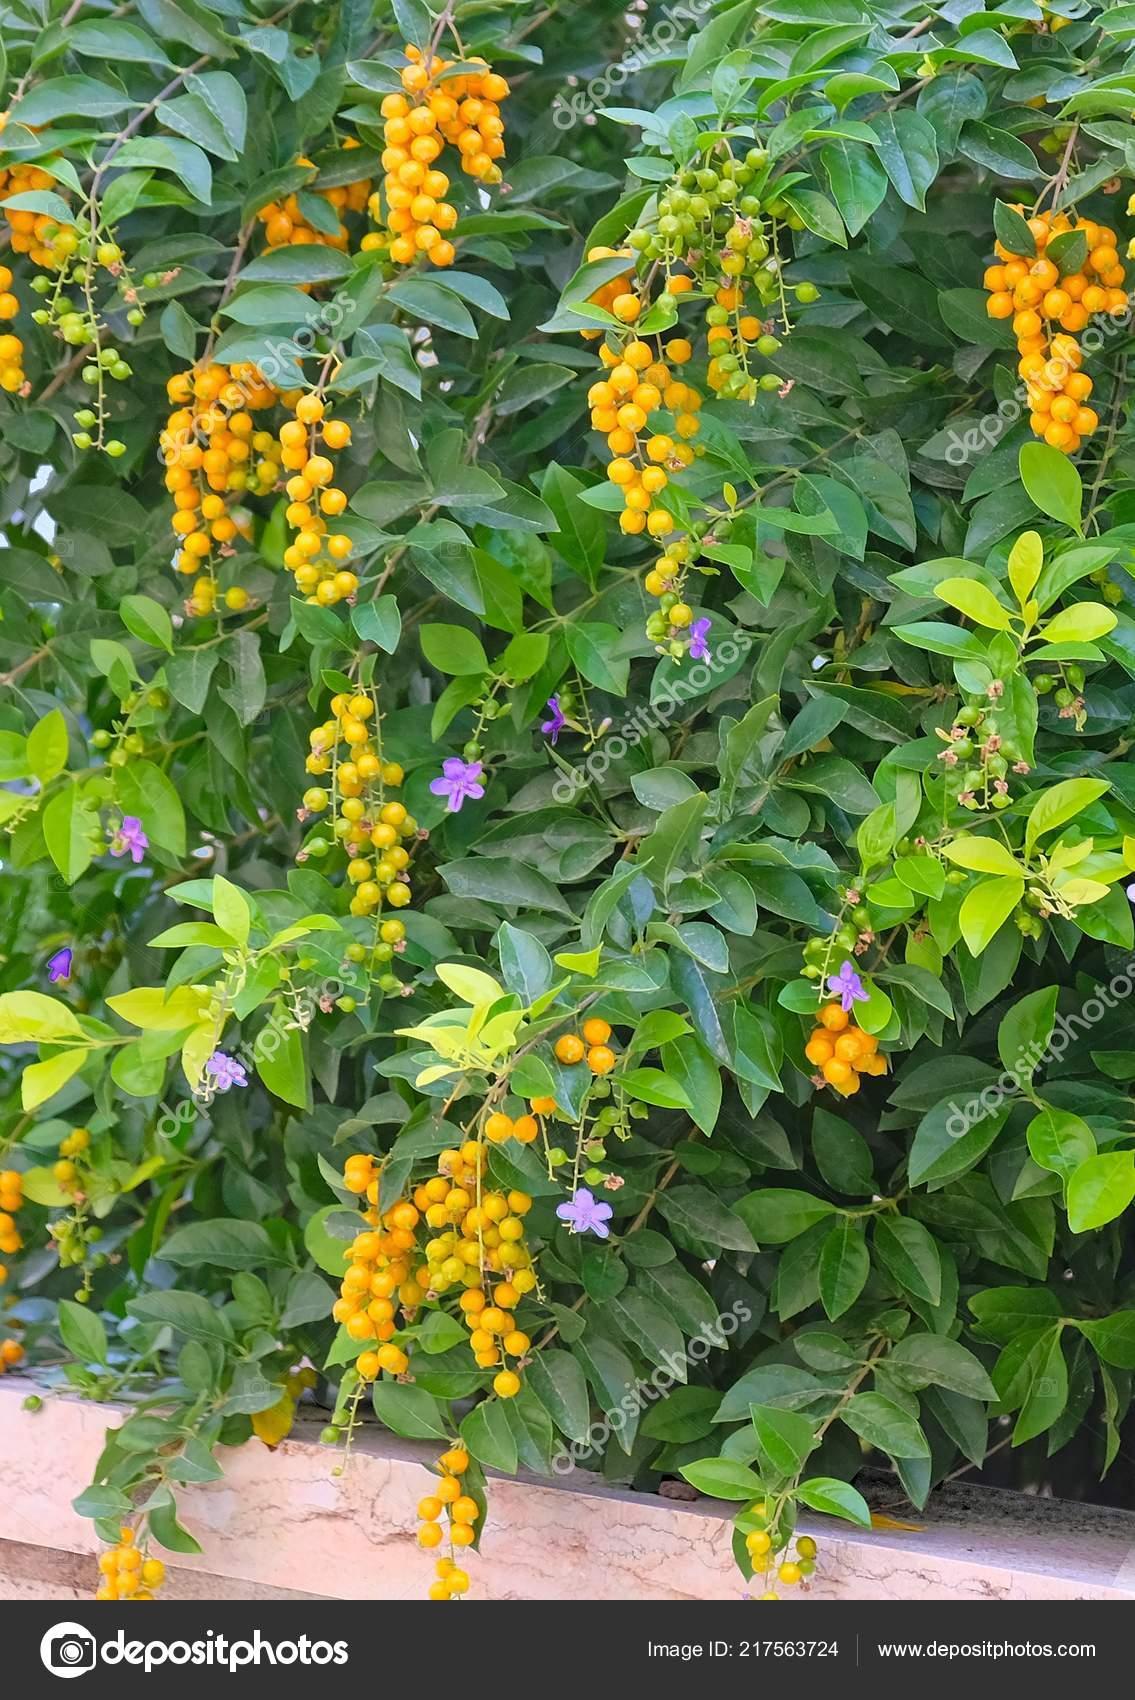 Bright Yellow Flowers Mahonia Growing Bushes Dense Green Foliage